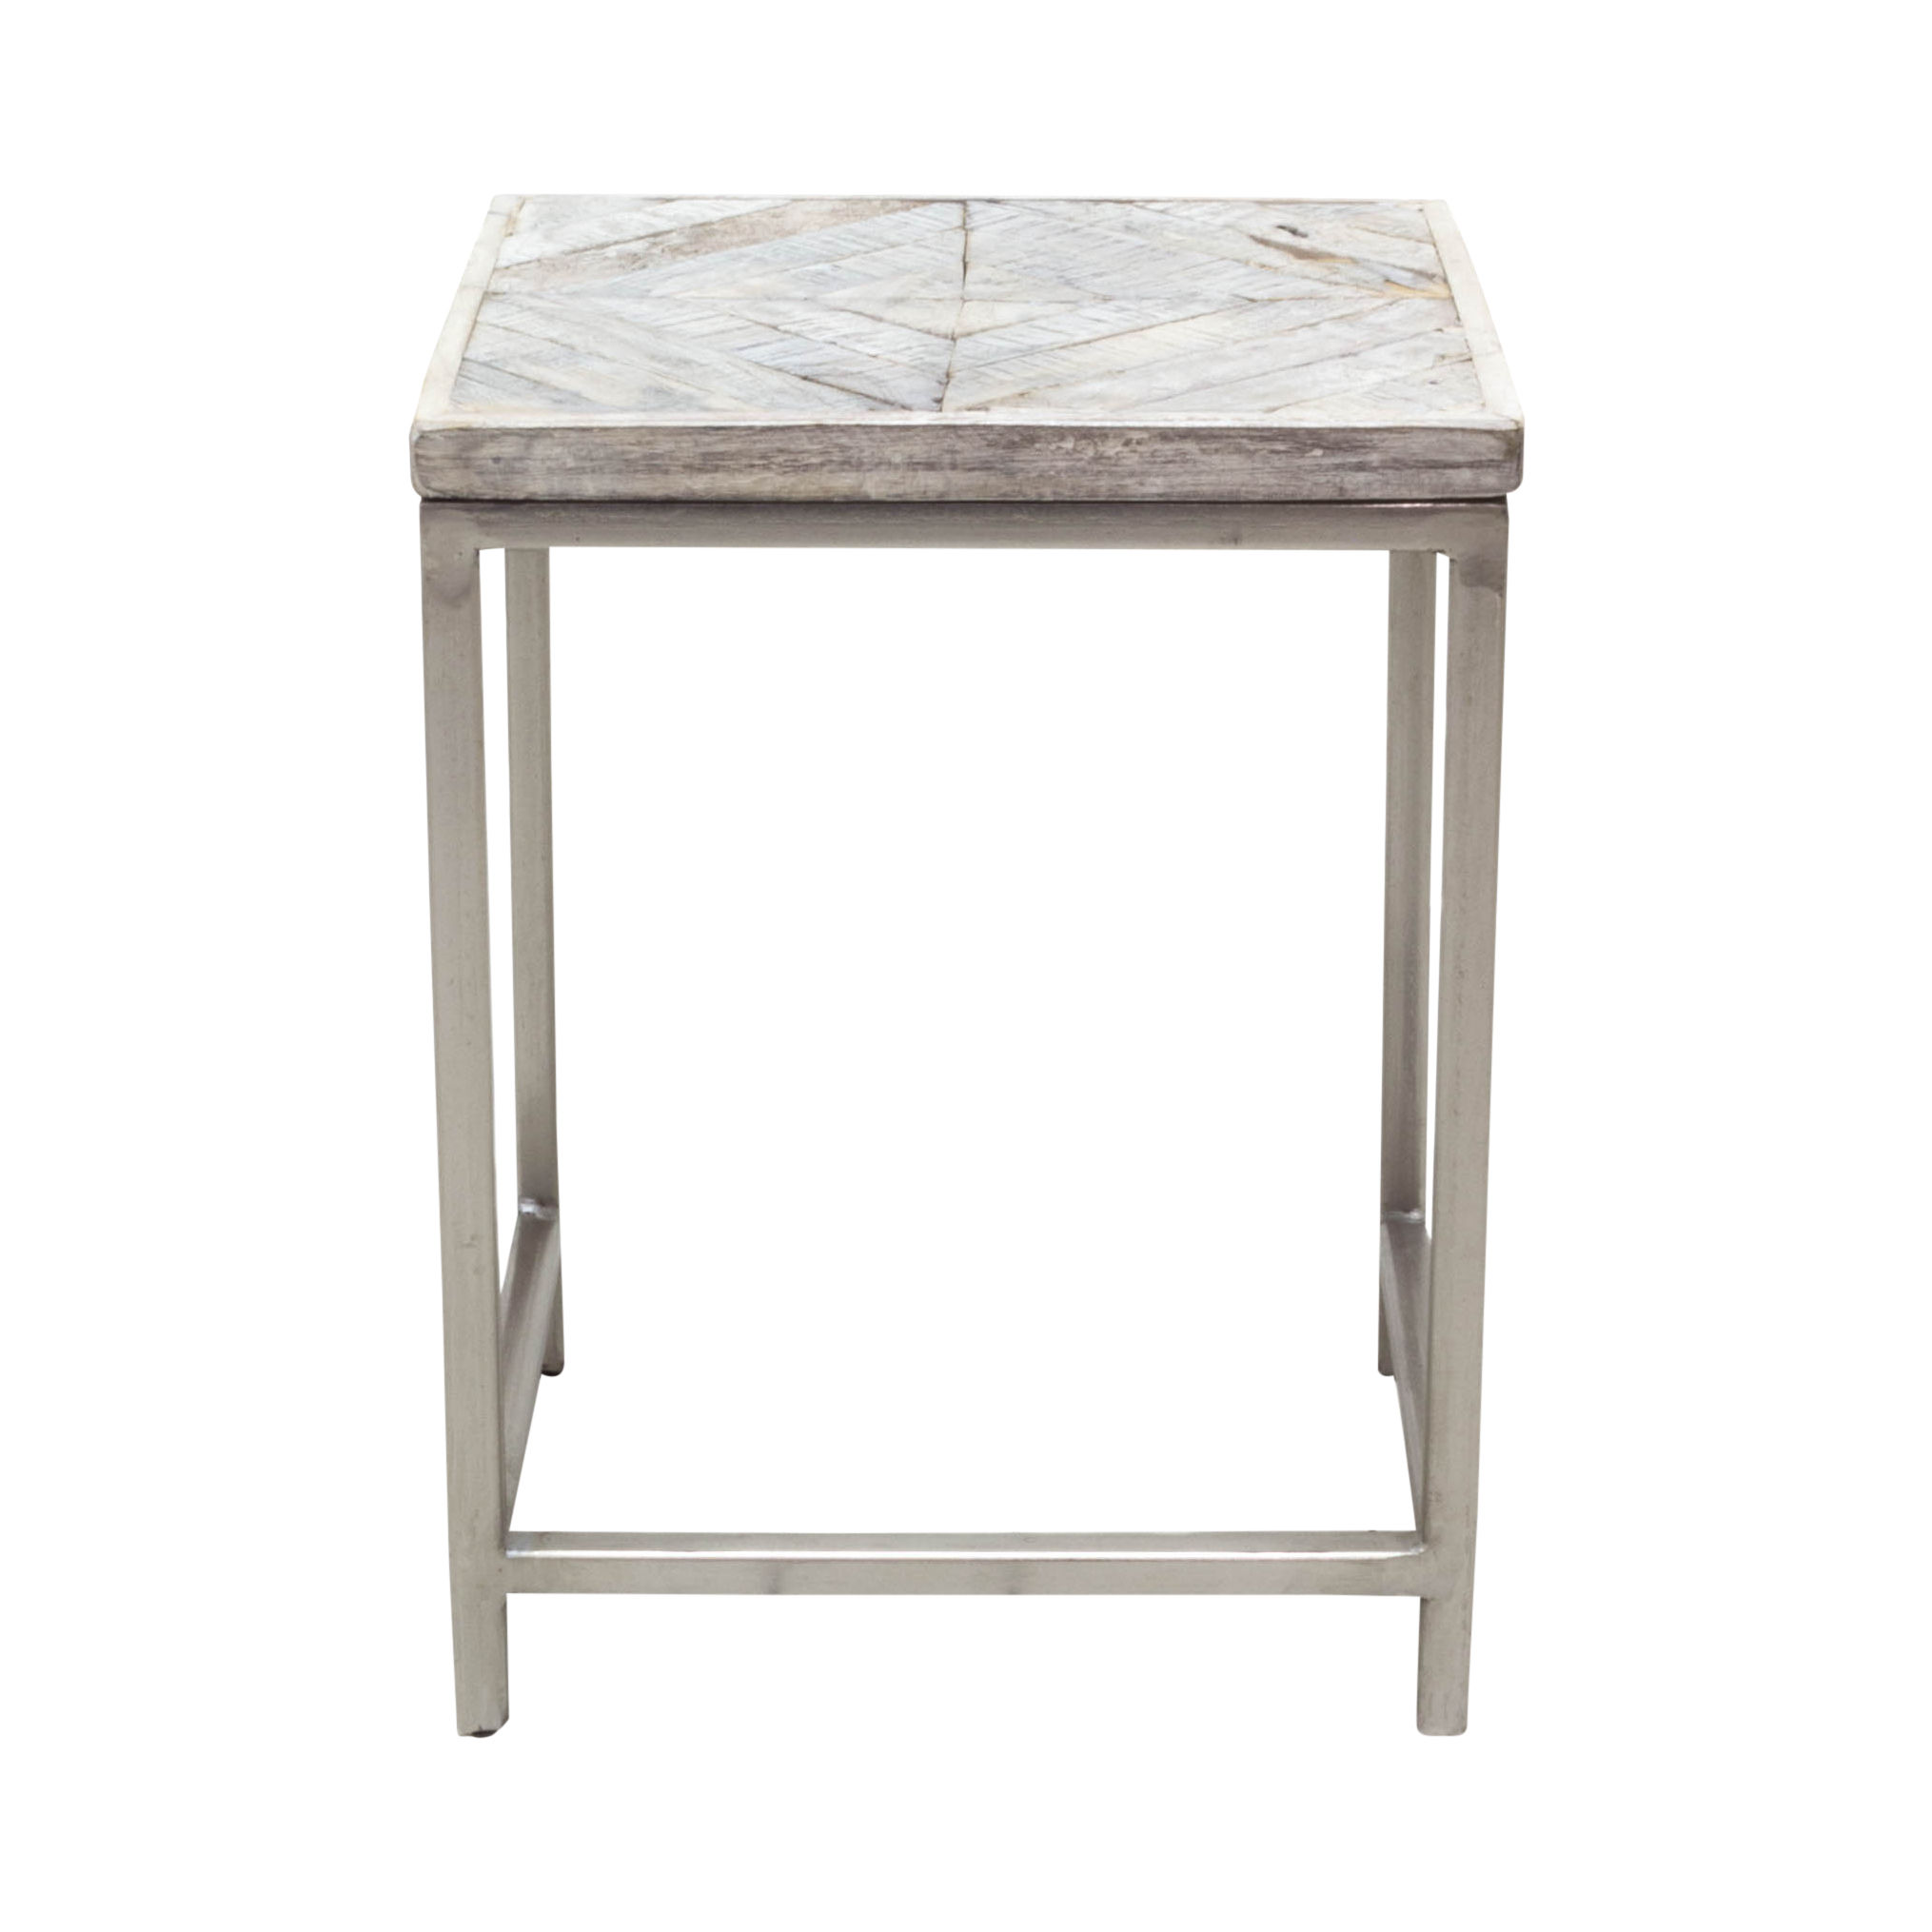 Amaya Tables - Medium